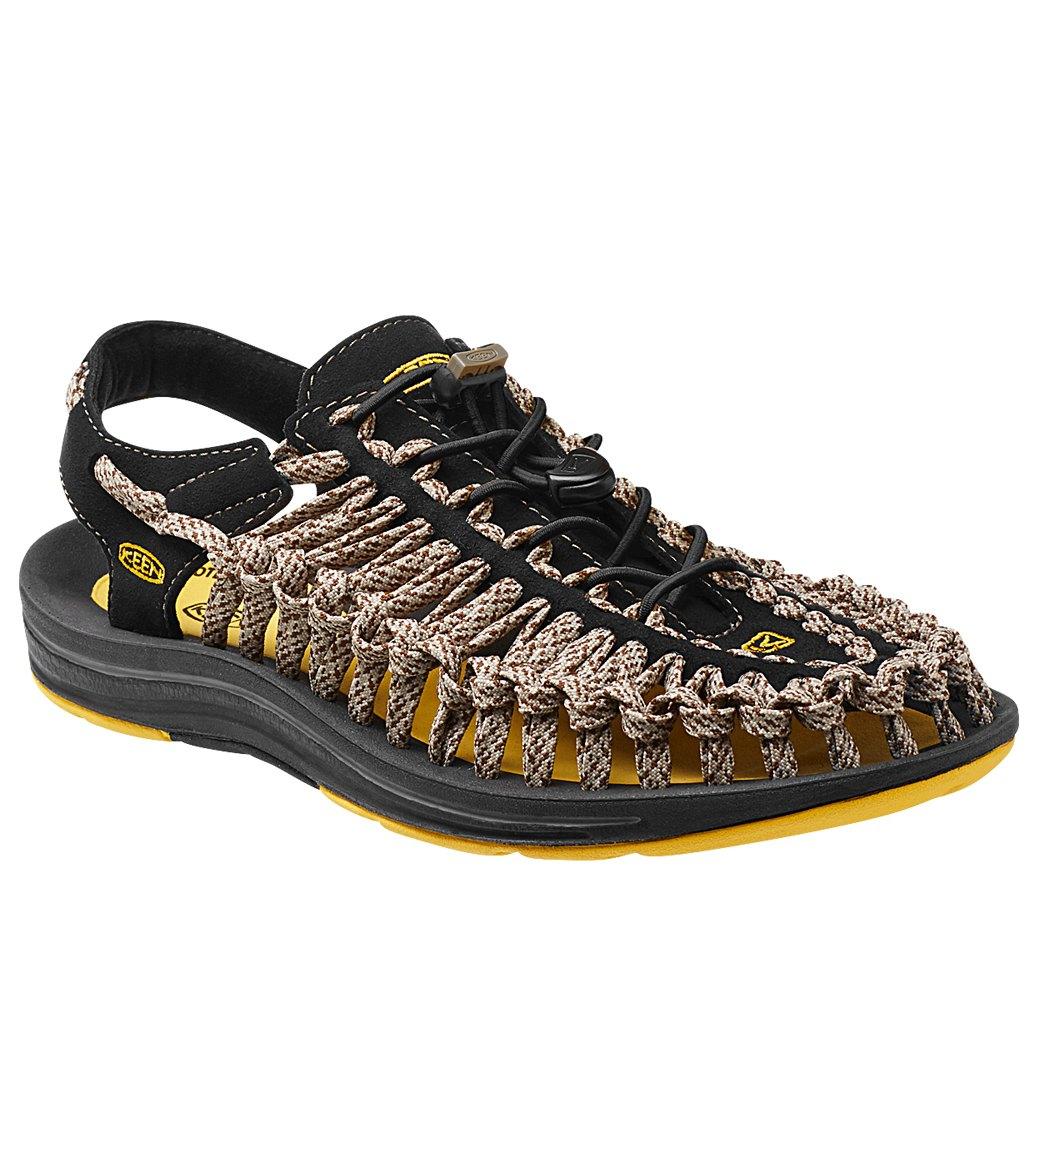 a82542208529 Keen Men s Uneek 8mm Camo Water Shoes at SwimOutlet.com - Free ...